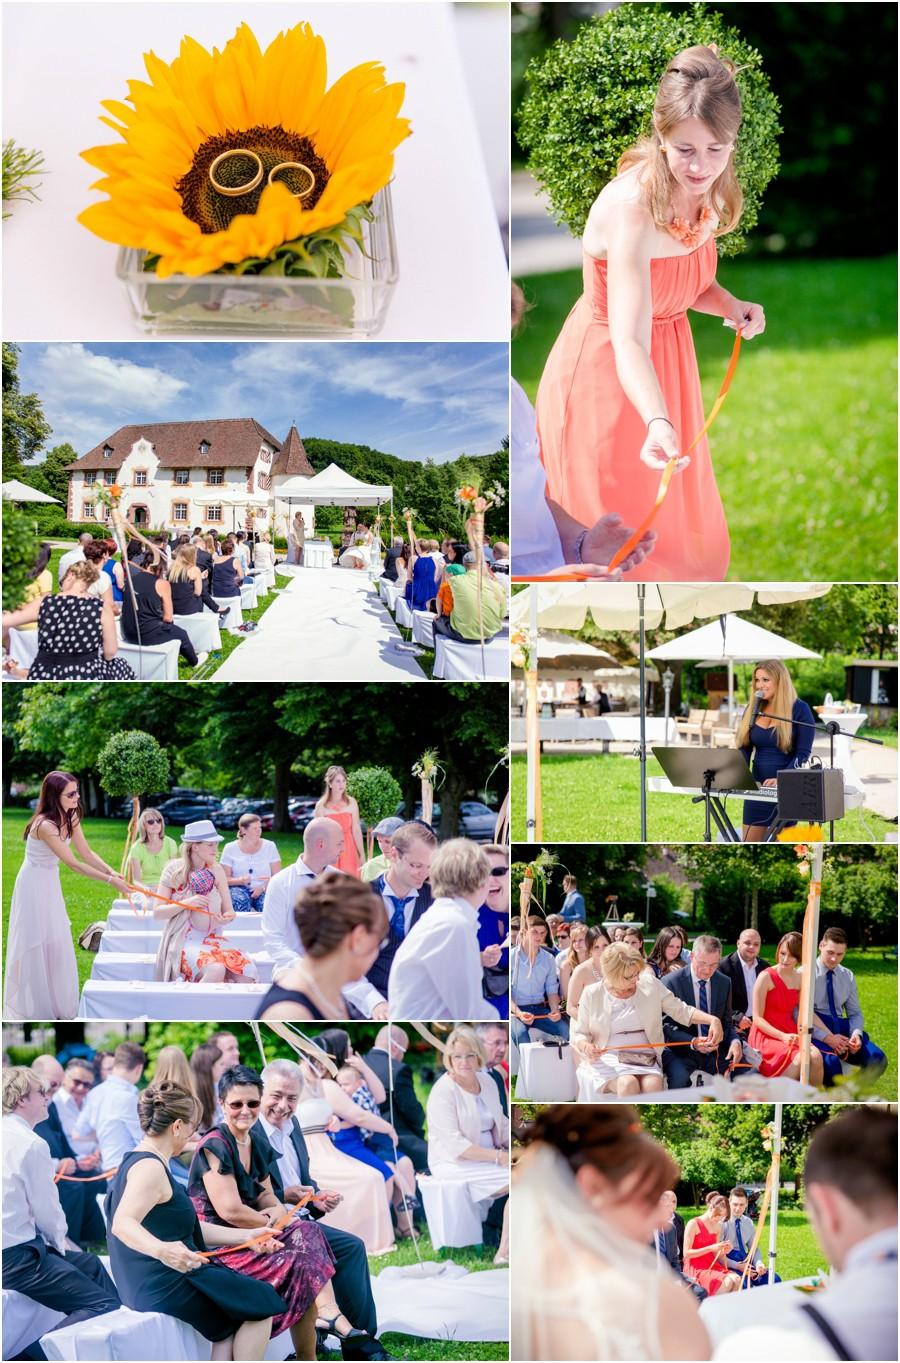 Hochzeitsreportage-Fotograf-Wasserschloss-Inzlingen-Loerrach_0006